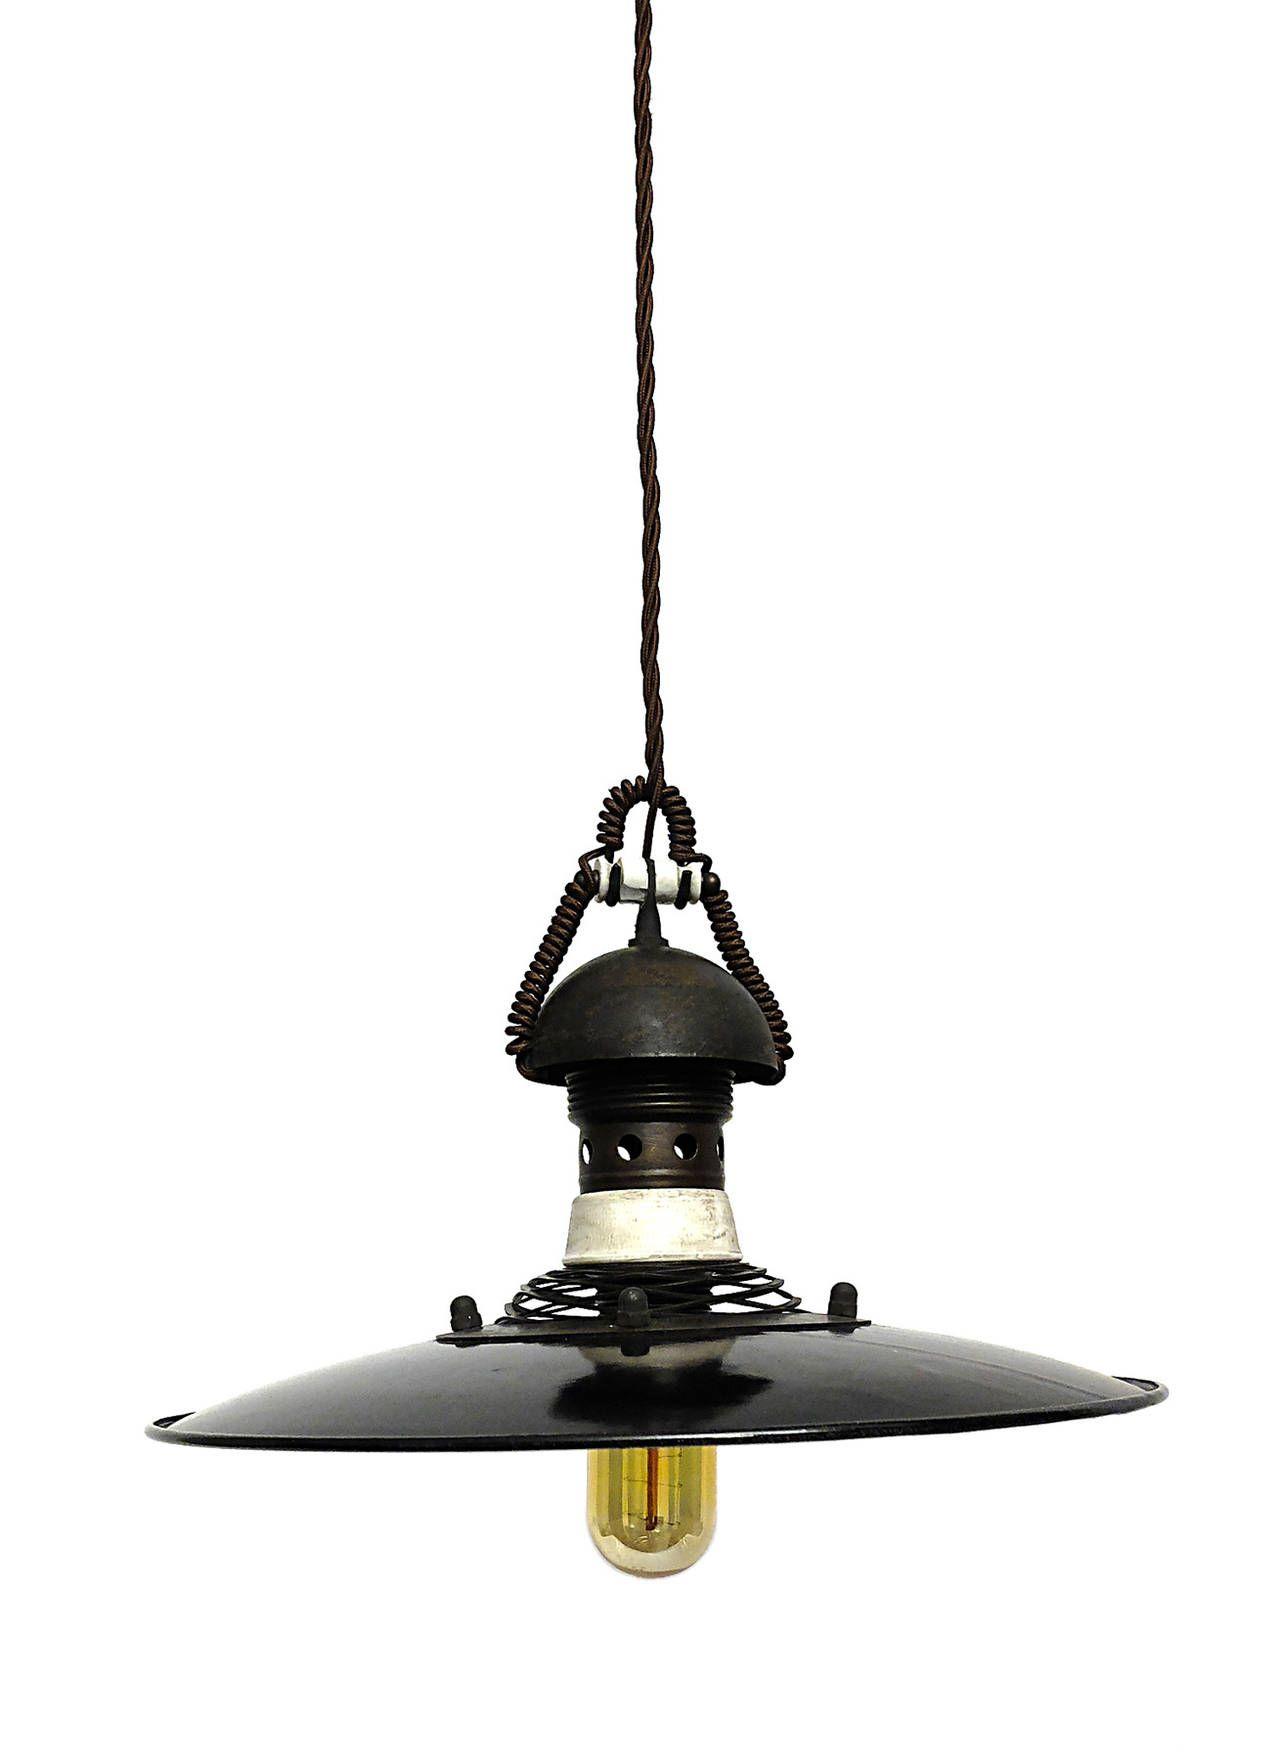 Set of six hanging enameled metal swinging lamps pendant lights